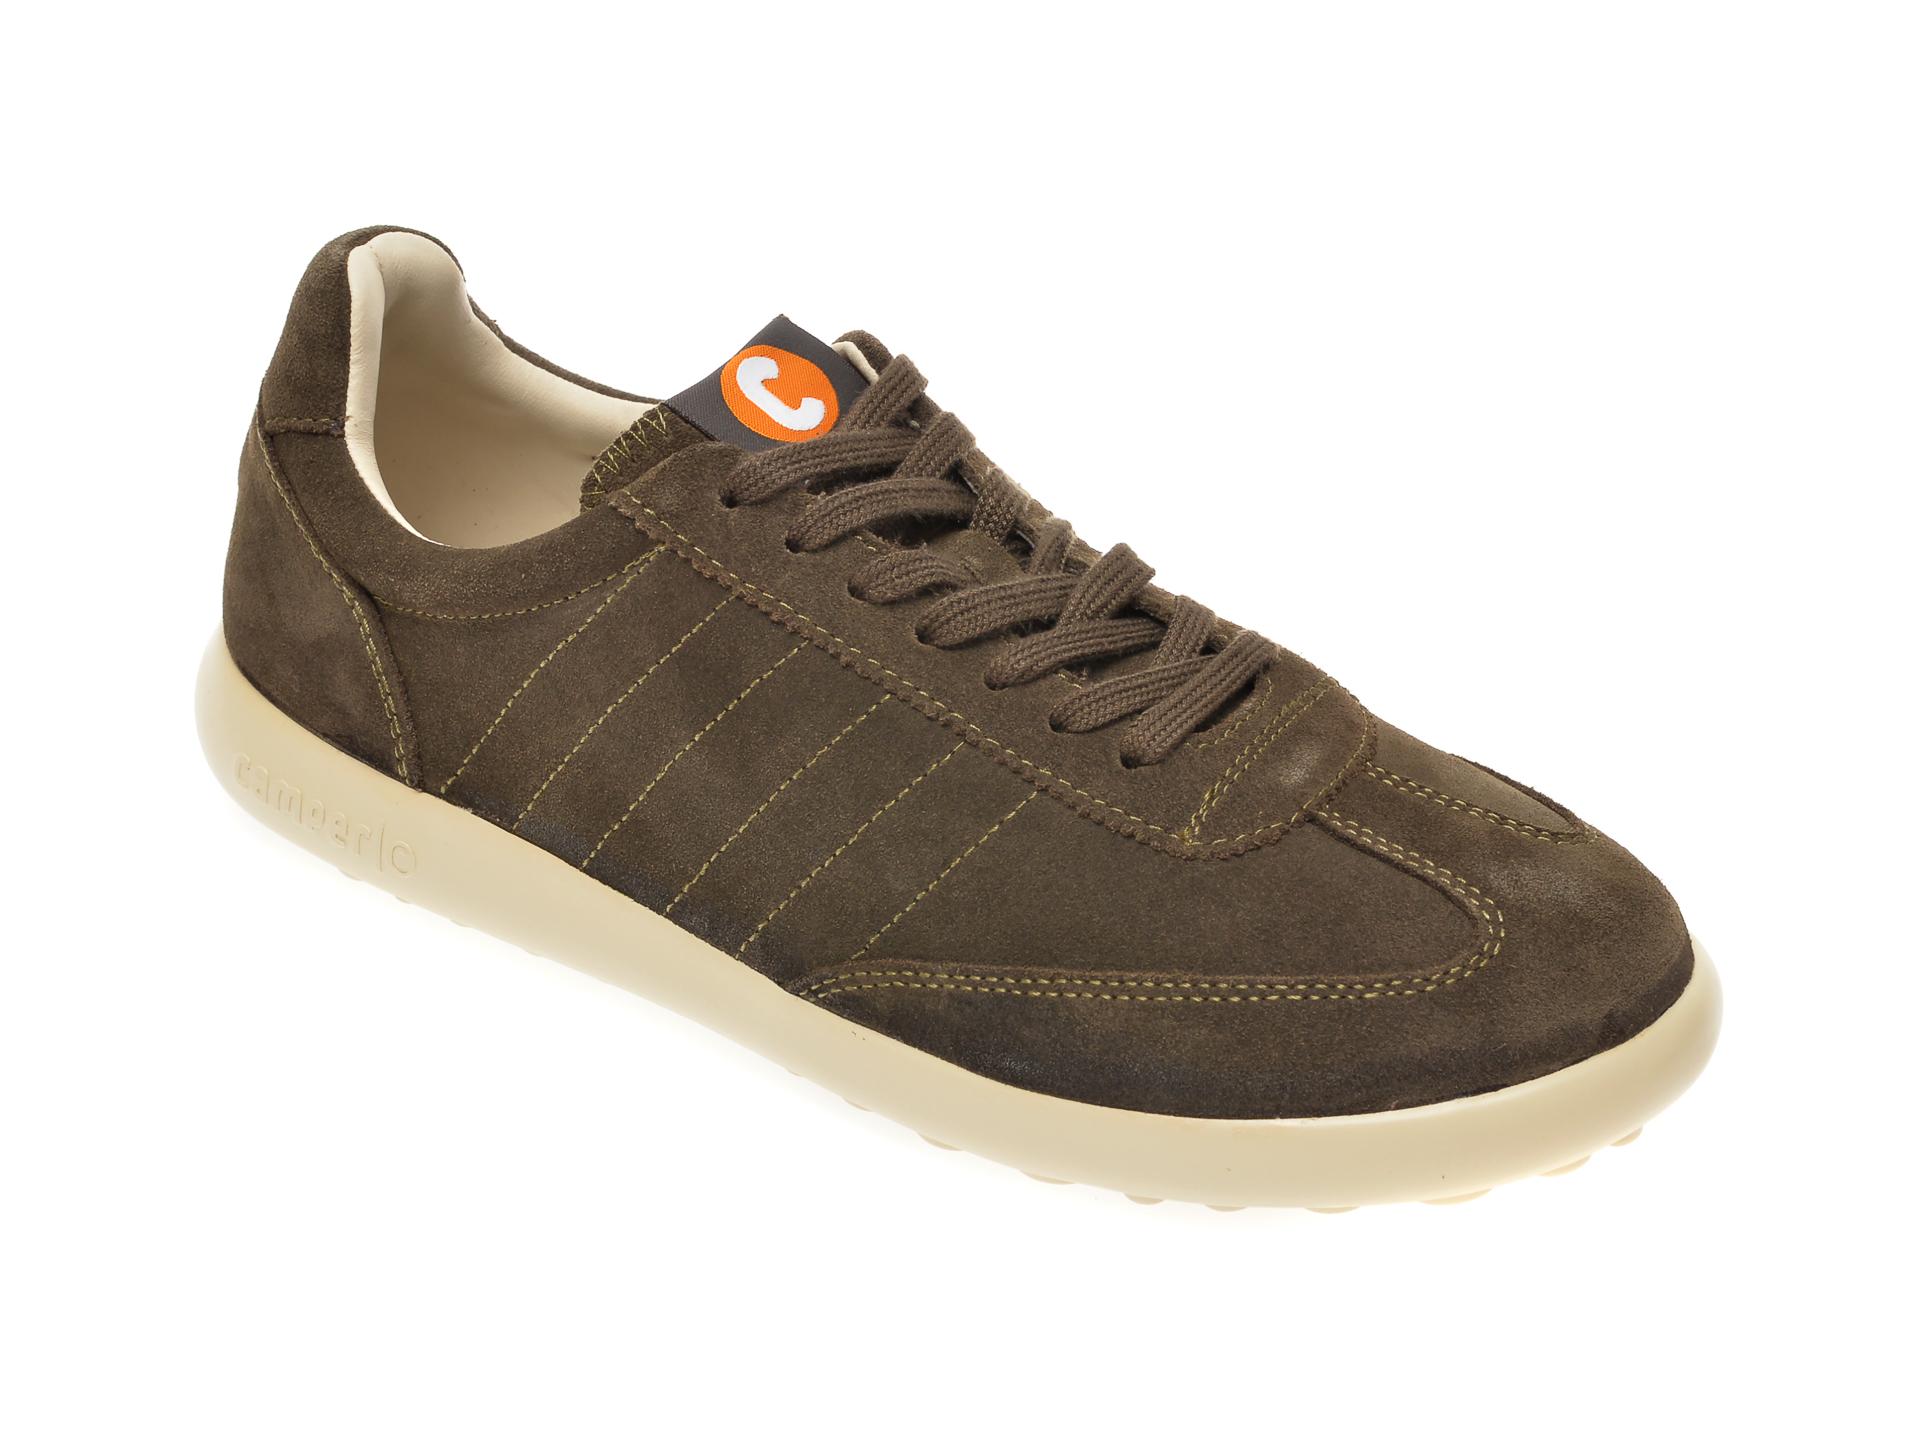 Pantofi CAMPER kaki, K100588, din piele intoarsa imagine